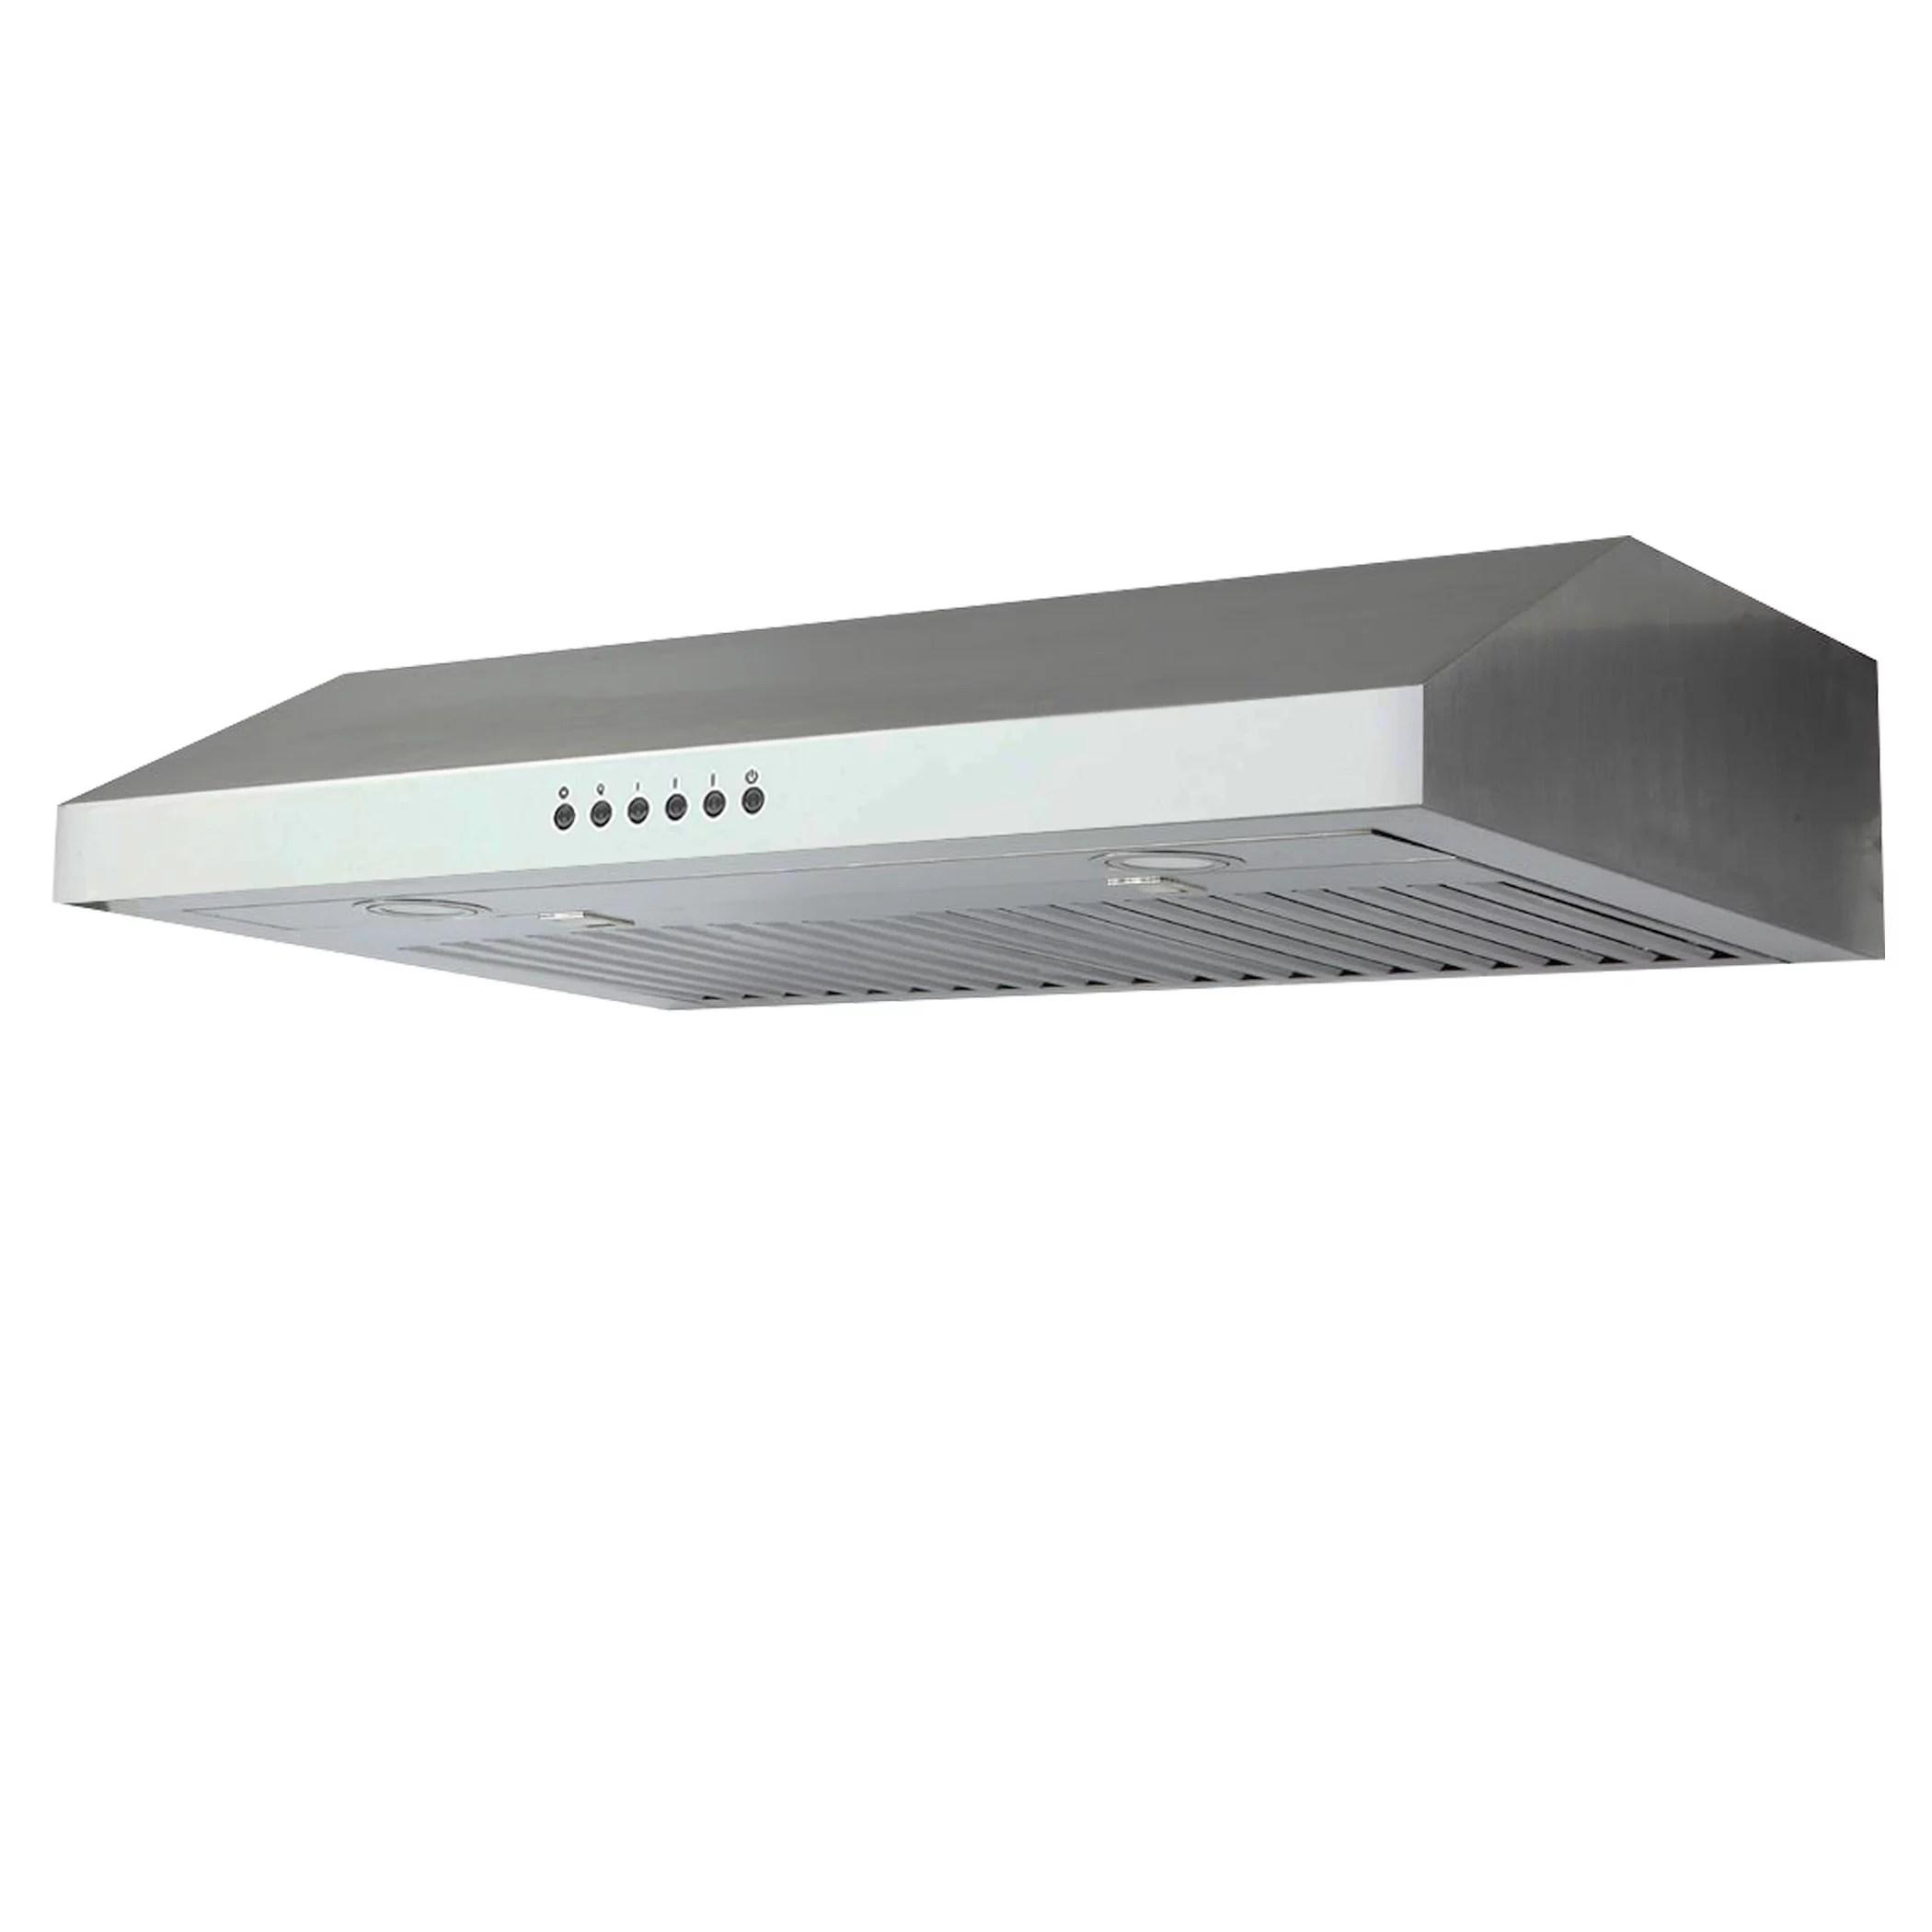 roxon 860 cfm 30 inches under cabinet range hood kitchen exhaust fan stainless steel rxn u02bd 30